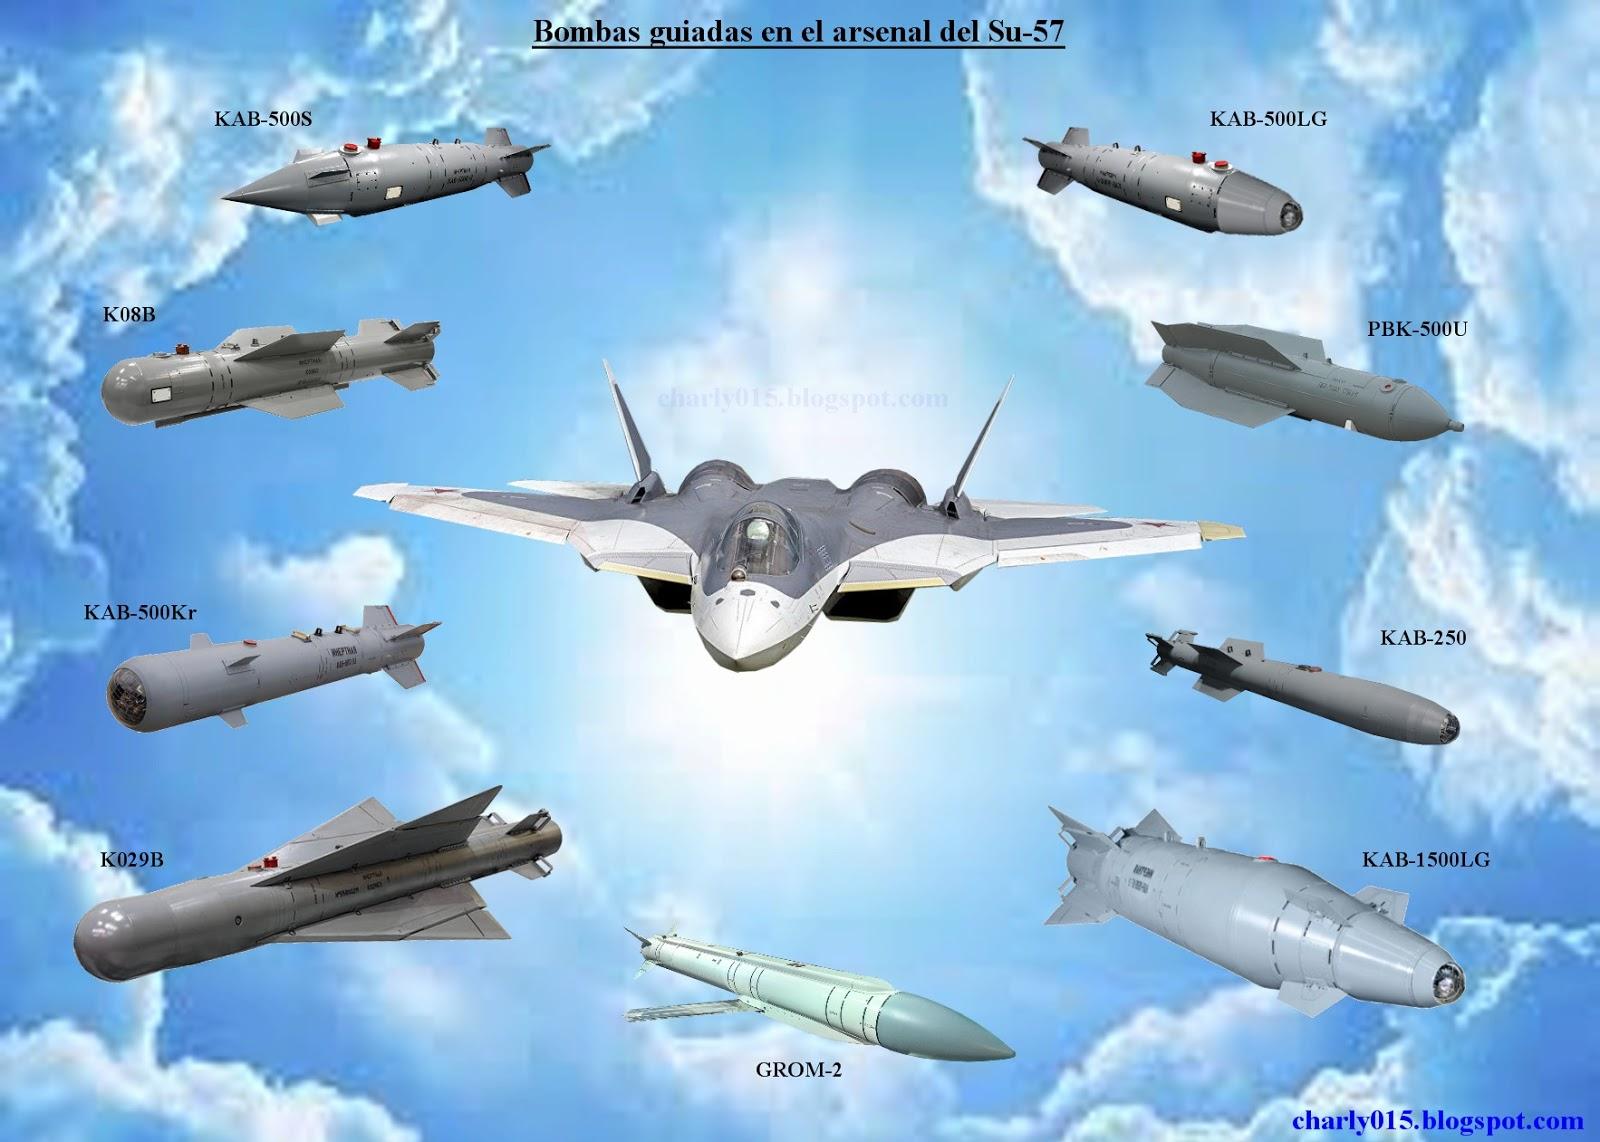 Su-57 Stealth Fighter: News #5 - Page 27 Su-57%2Barmamento%2Bbombas%2Bguiadas